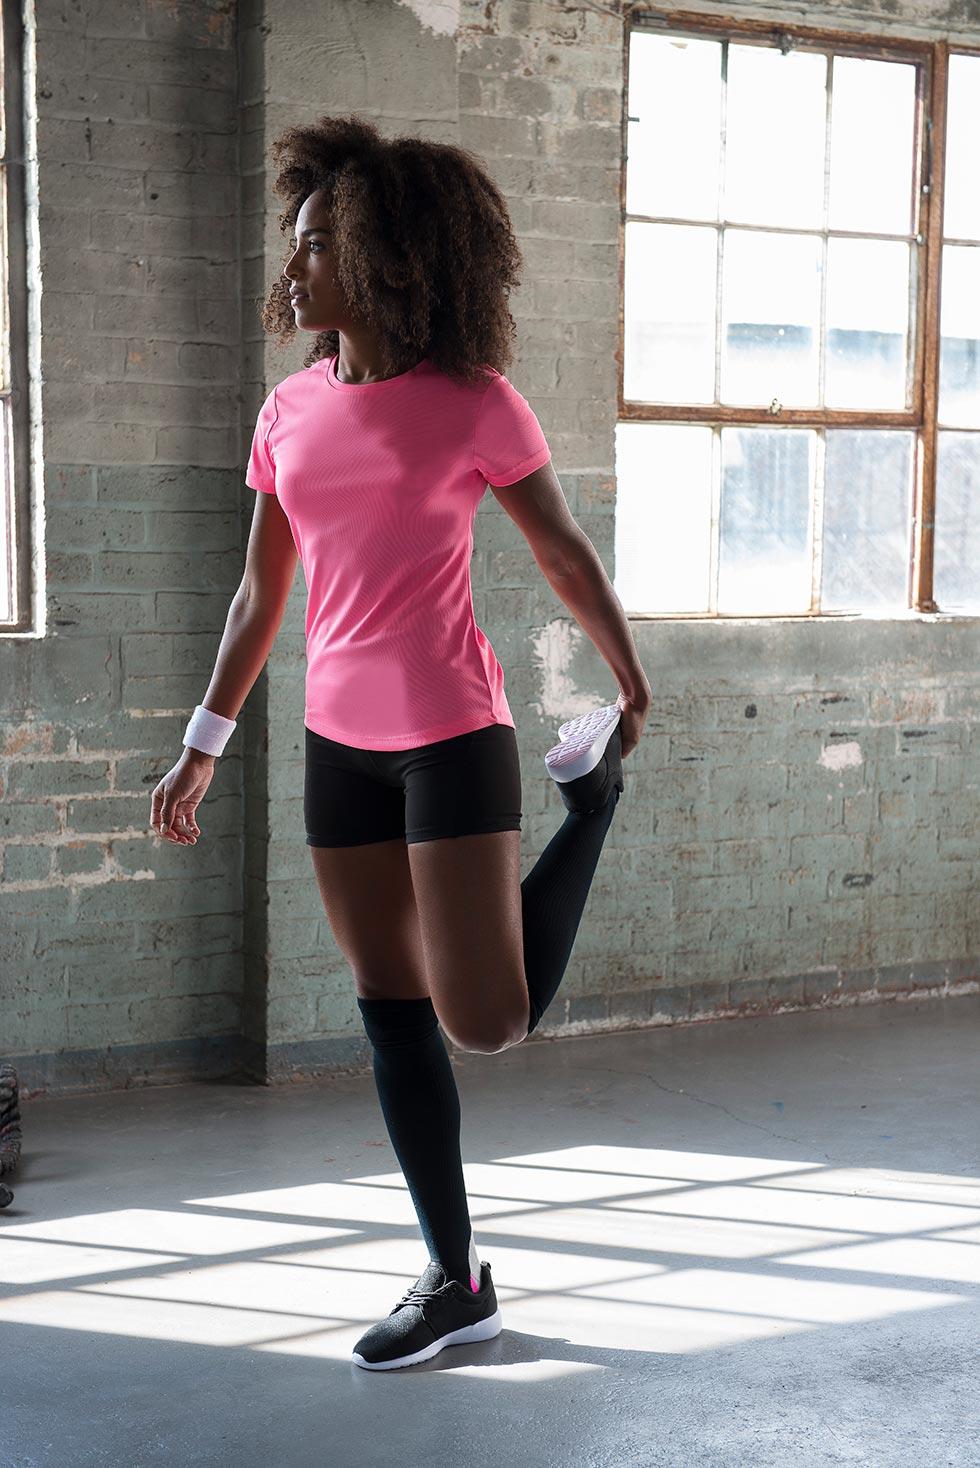 12dcc8482b89 Funktions T-Shirt Damen Just Cool Rundhals Activ Shirt - werk5 ...